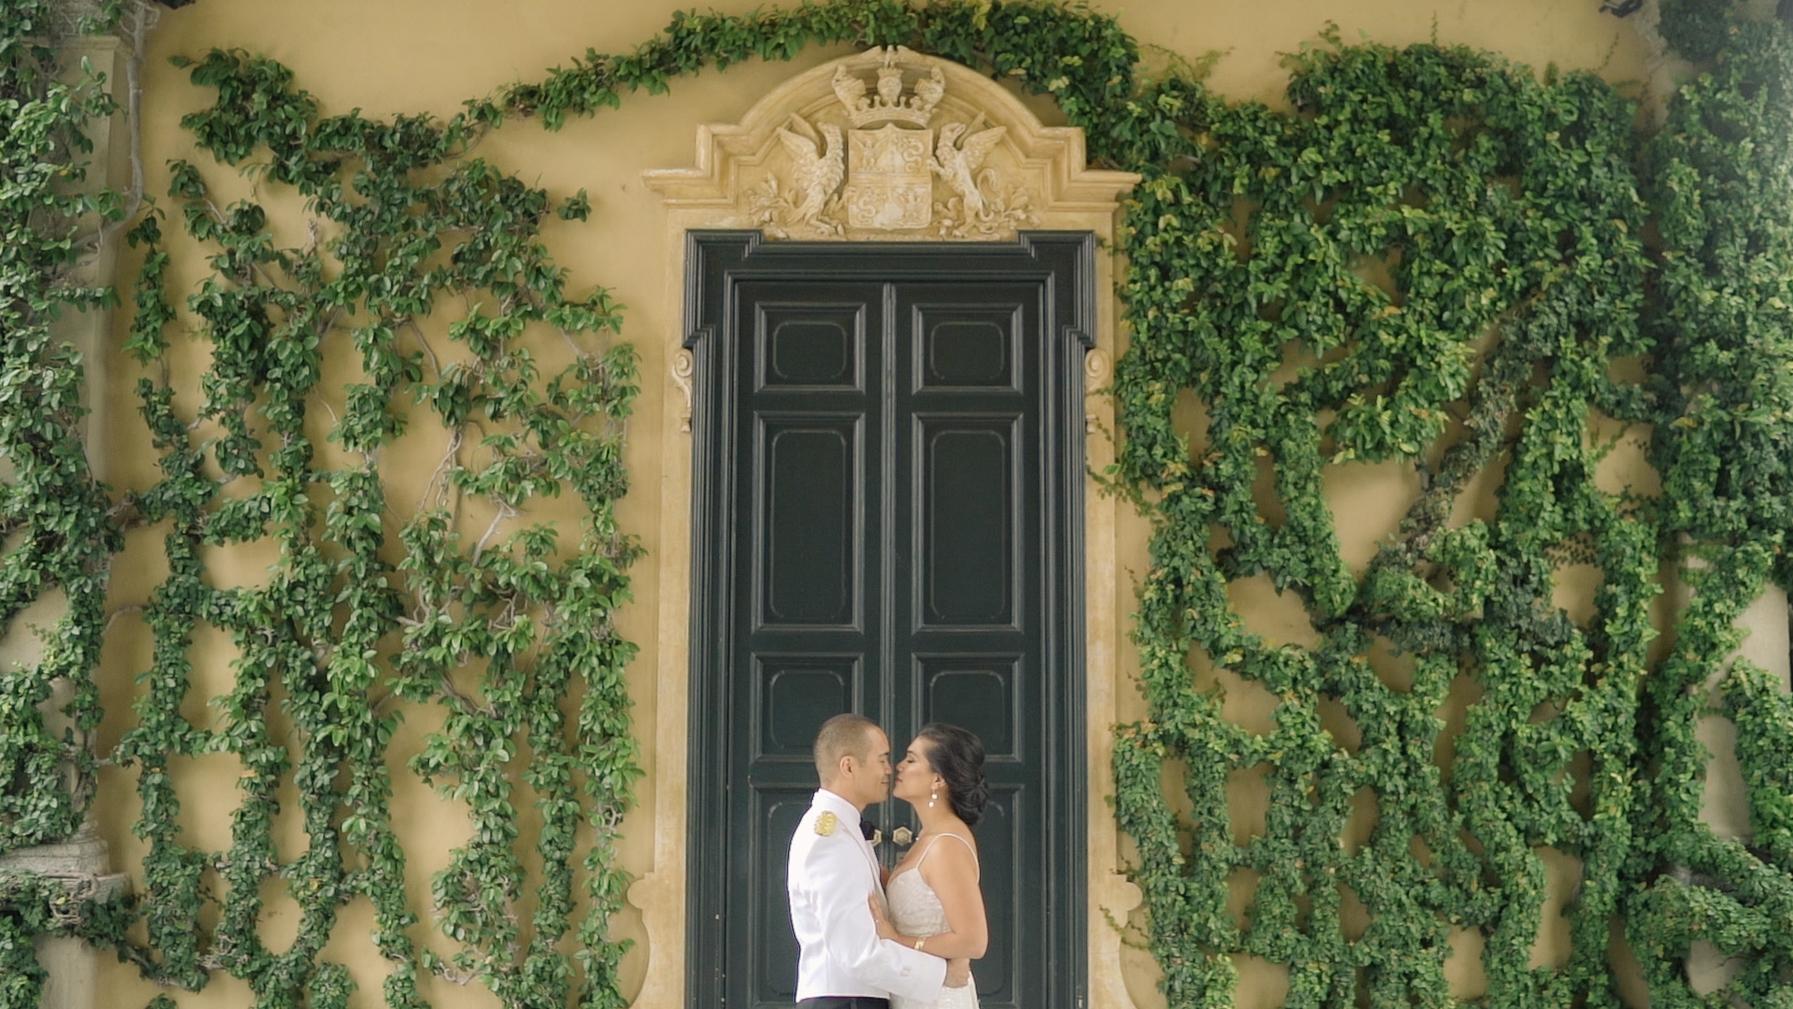 Lake como_ villa Balbianello_wedding_-3.jpg